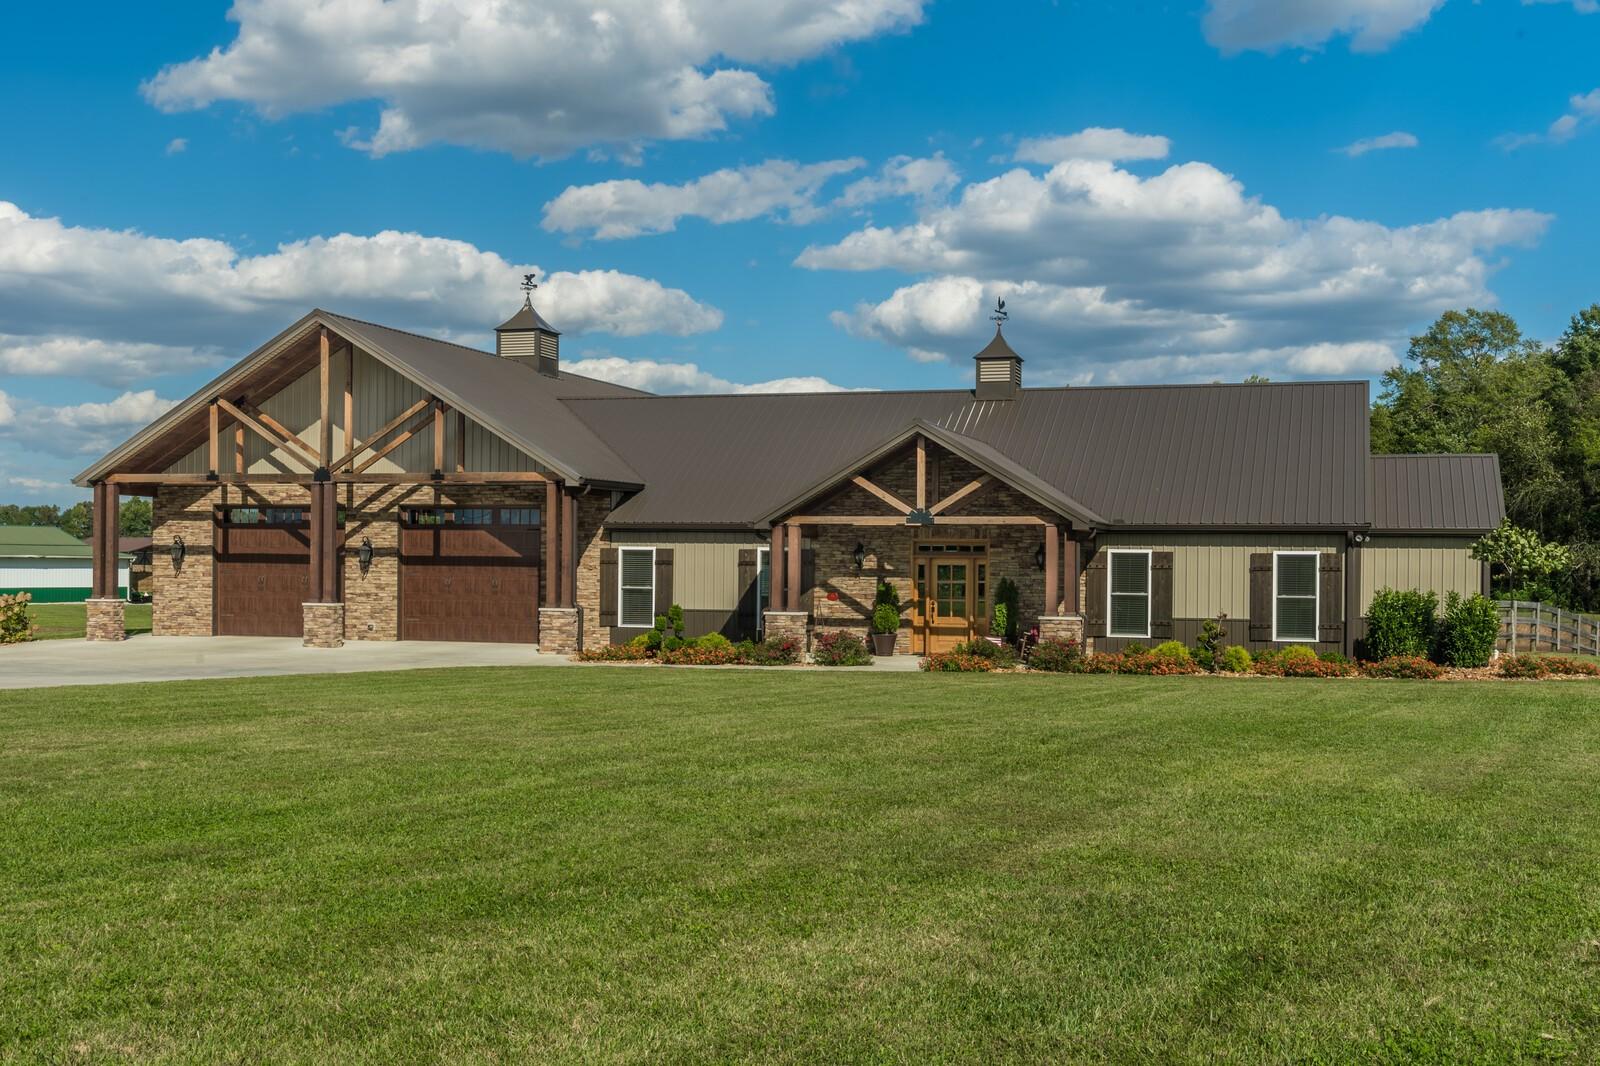 1039 Nisha Ln Property Photo - Cedar Hill, TN real estate listing